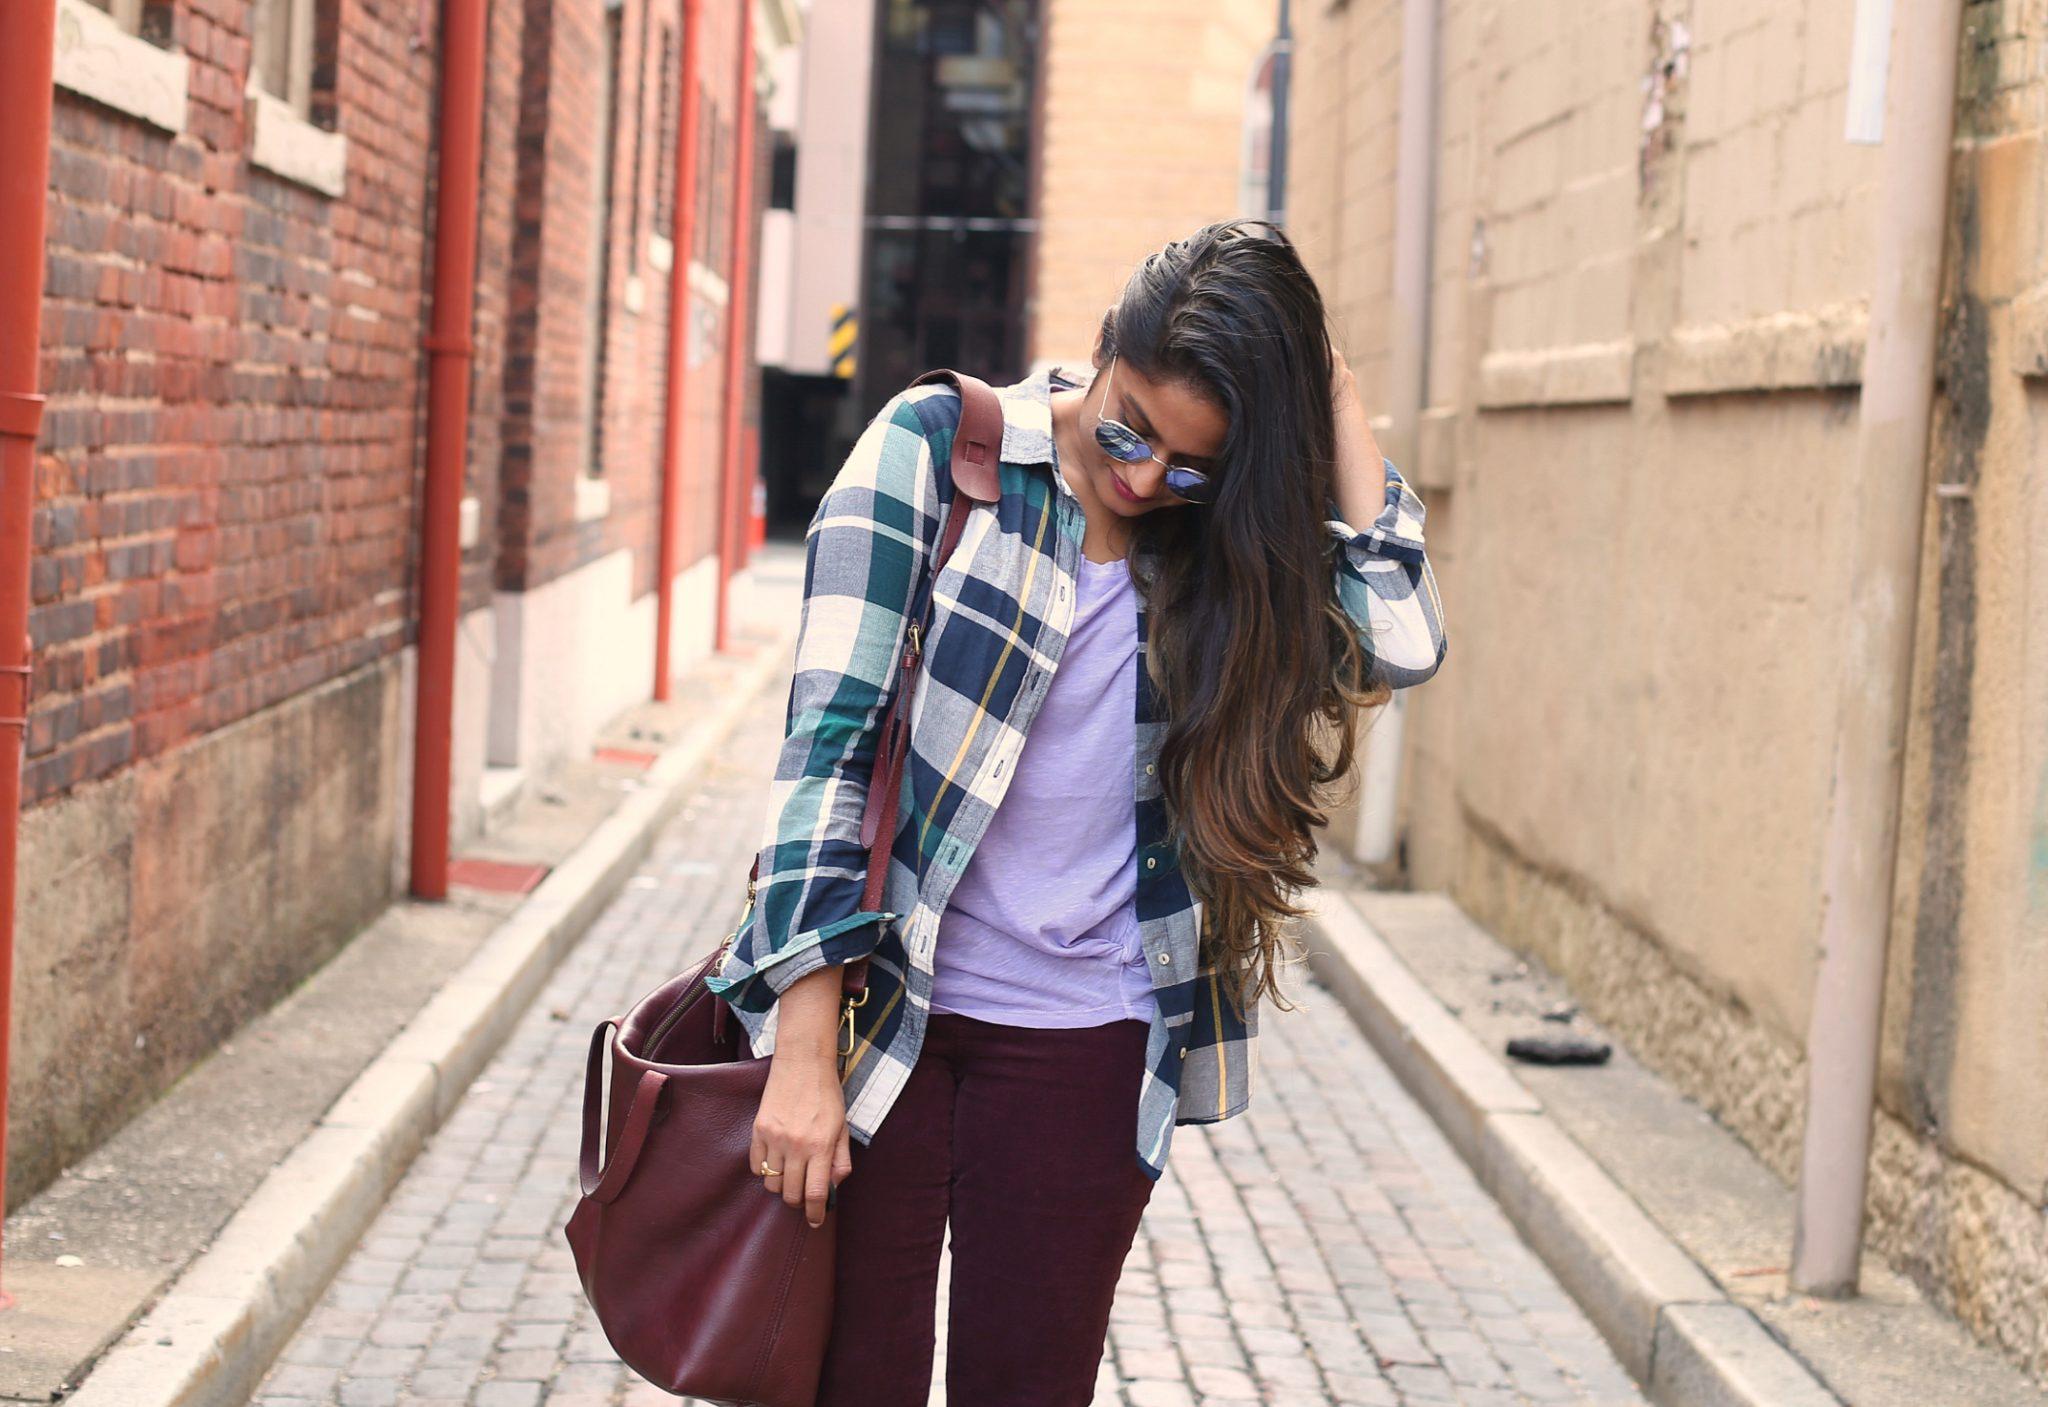 hm-flannel-shirt-green